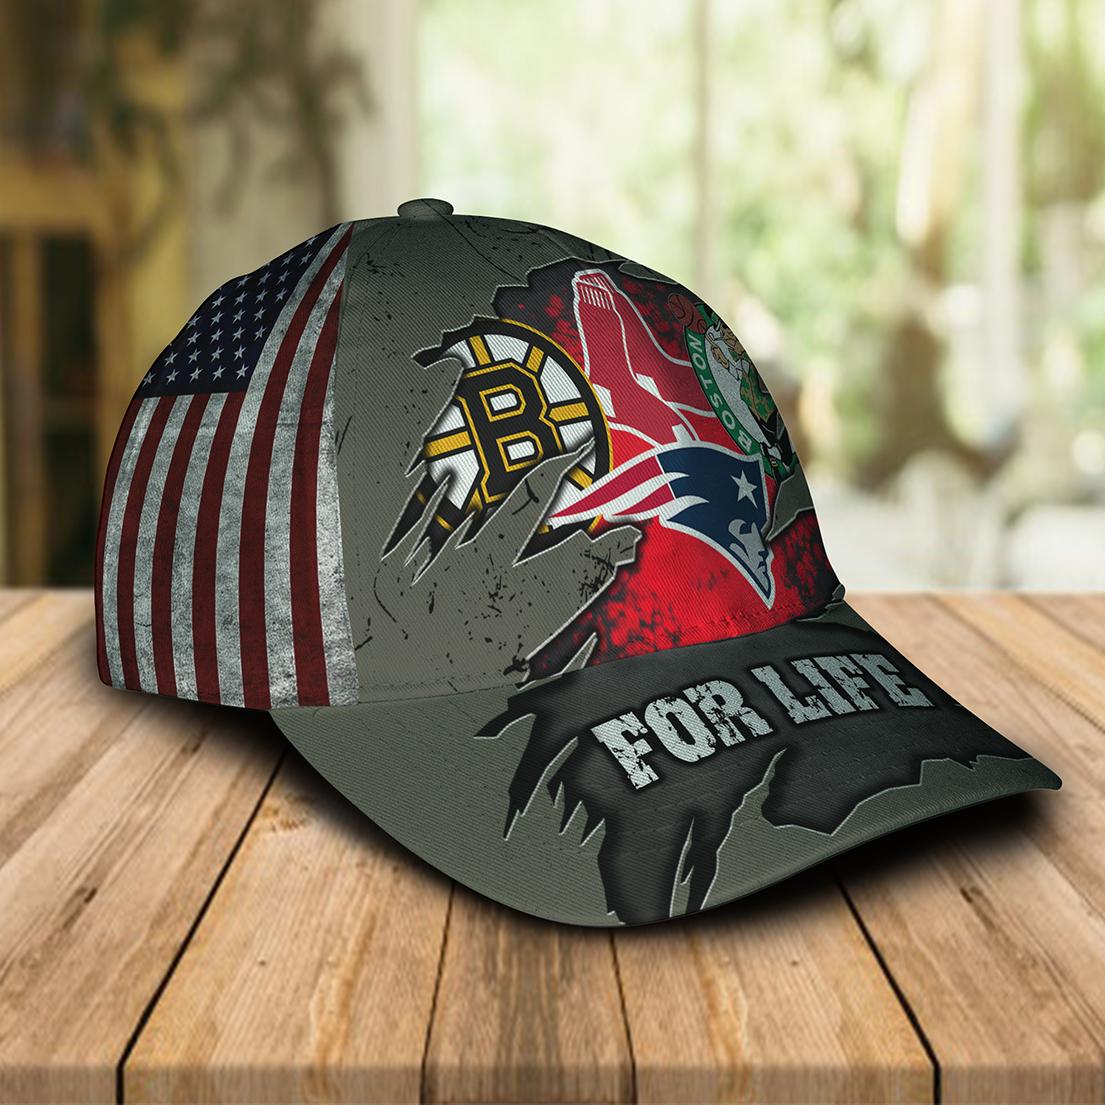 Boston Celtics New England Patriots Boston Bruins Boston Red Sox For Life Cap Hat